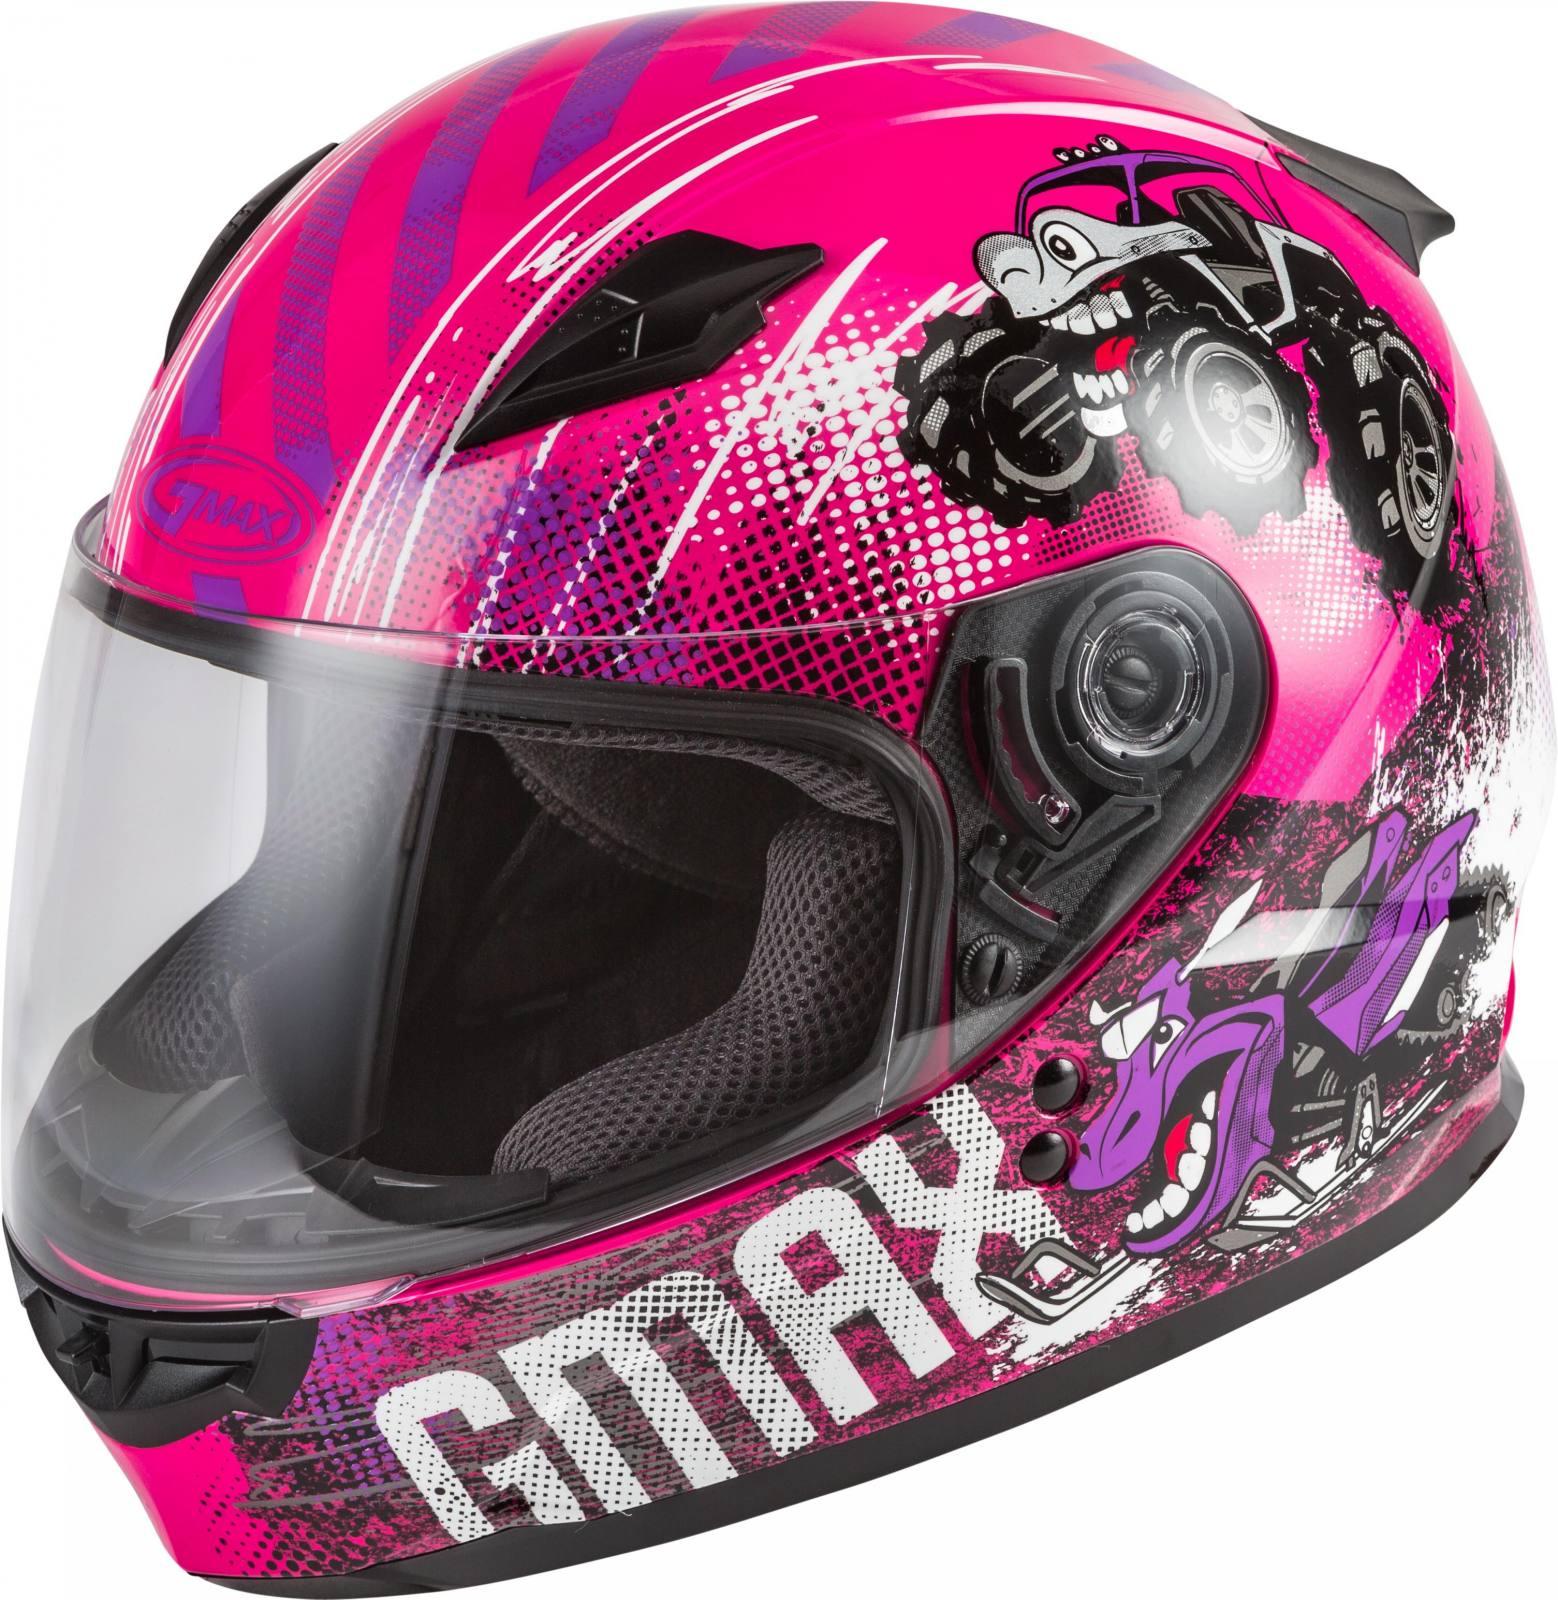 GMAX GM49Y Alien Full Face Youth Girls Motorcycle Street Riding Helmet